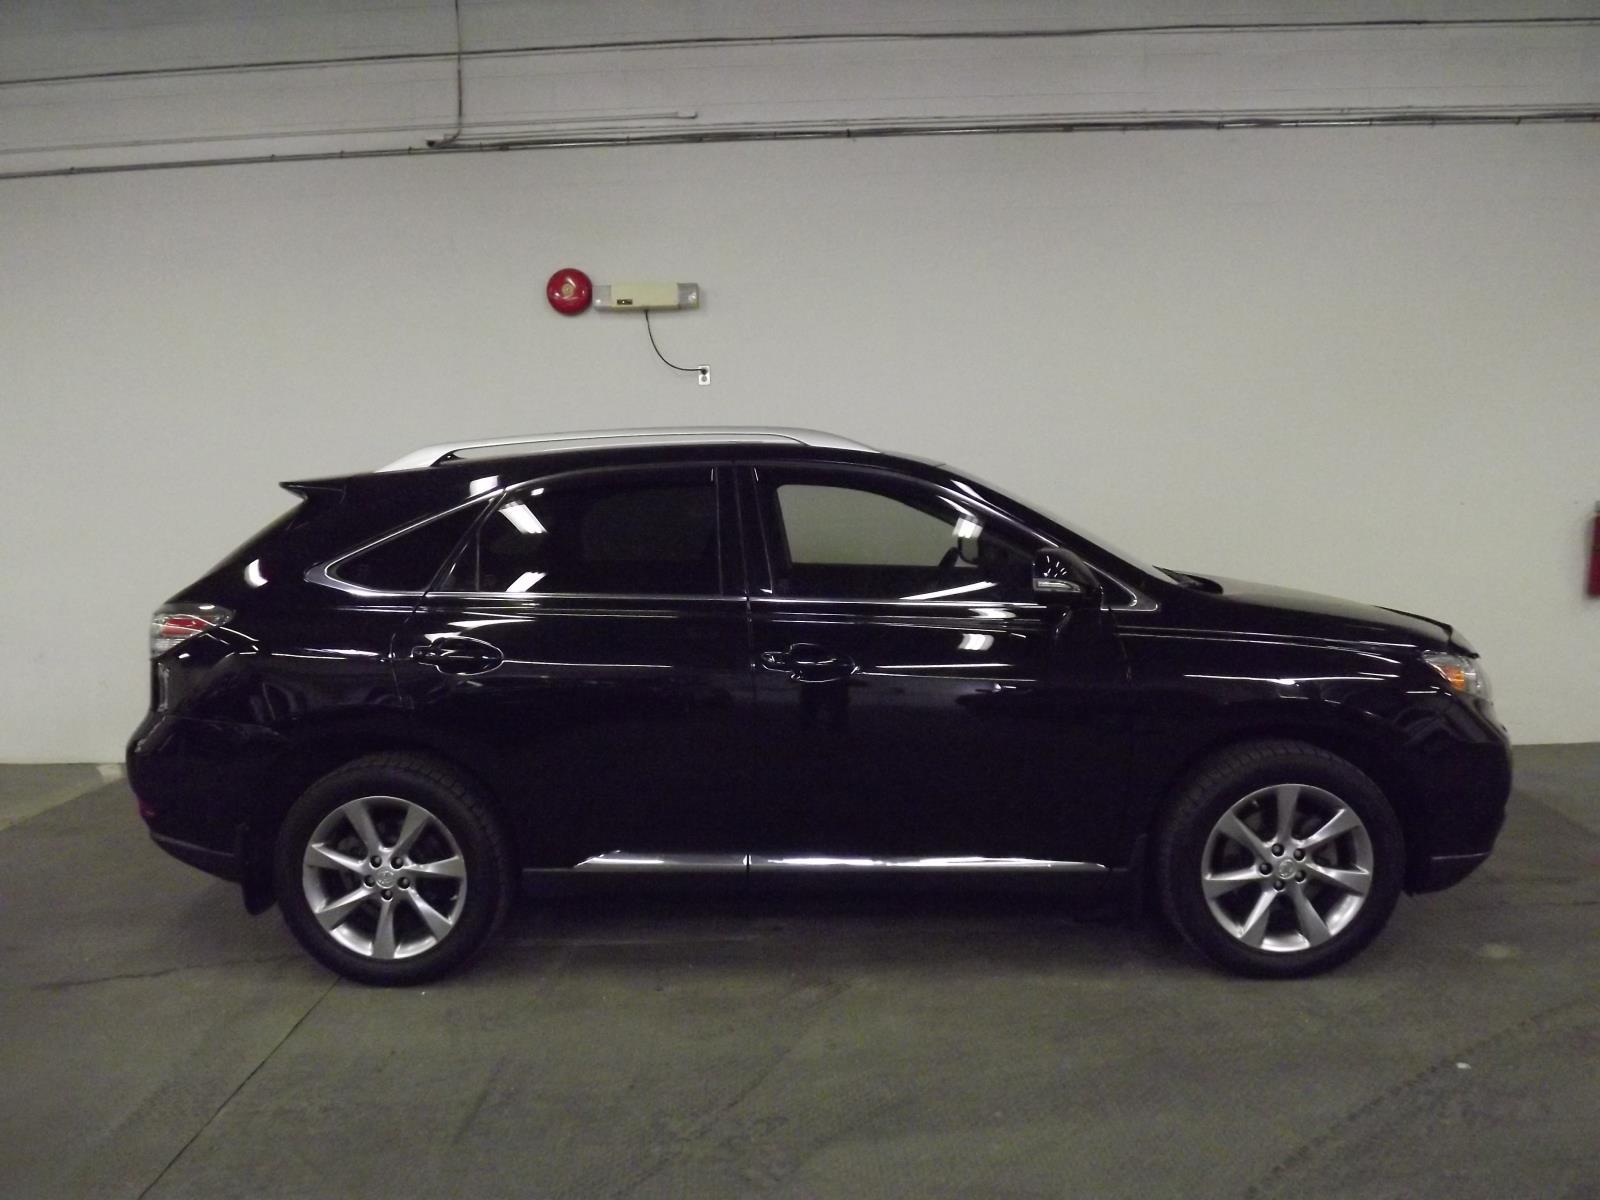 Used 2010 Lexus RX350 in Edmonton,AB